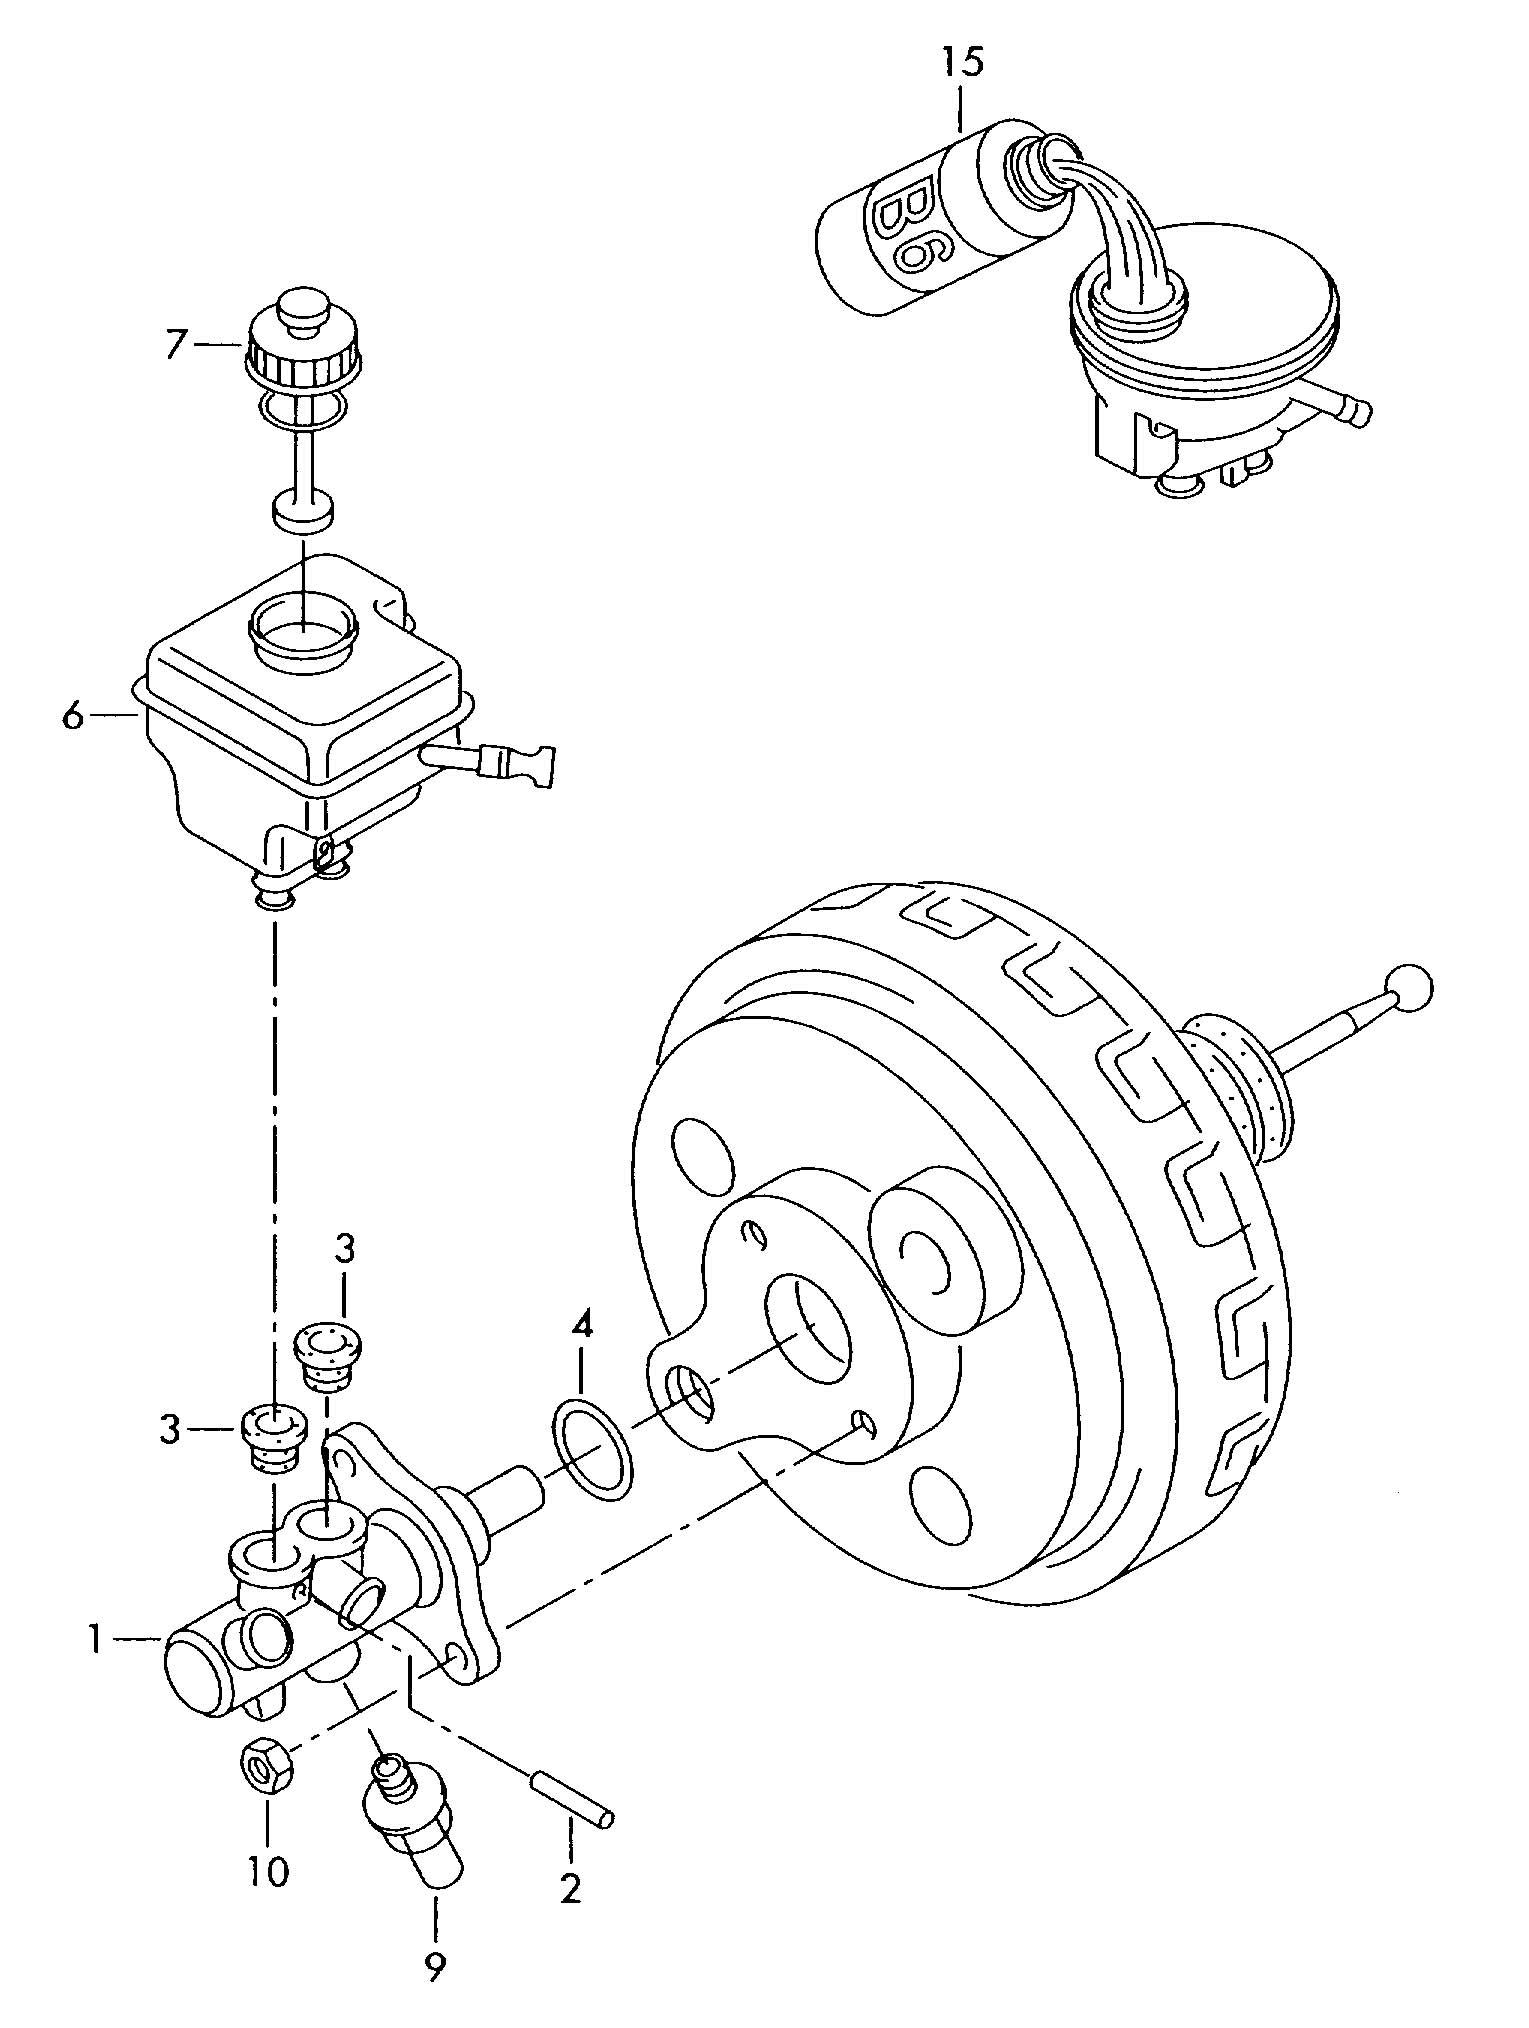 tags: #vw beetle engine diagram#volkswagen brake parts#vw 5 cylinder vacuum  diagrams#dune buggy brake systems#vw beetle parts#vw beetle front schematic#car